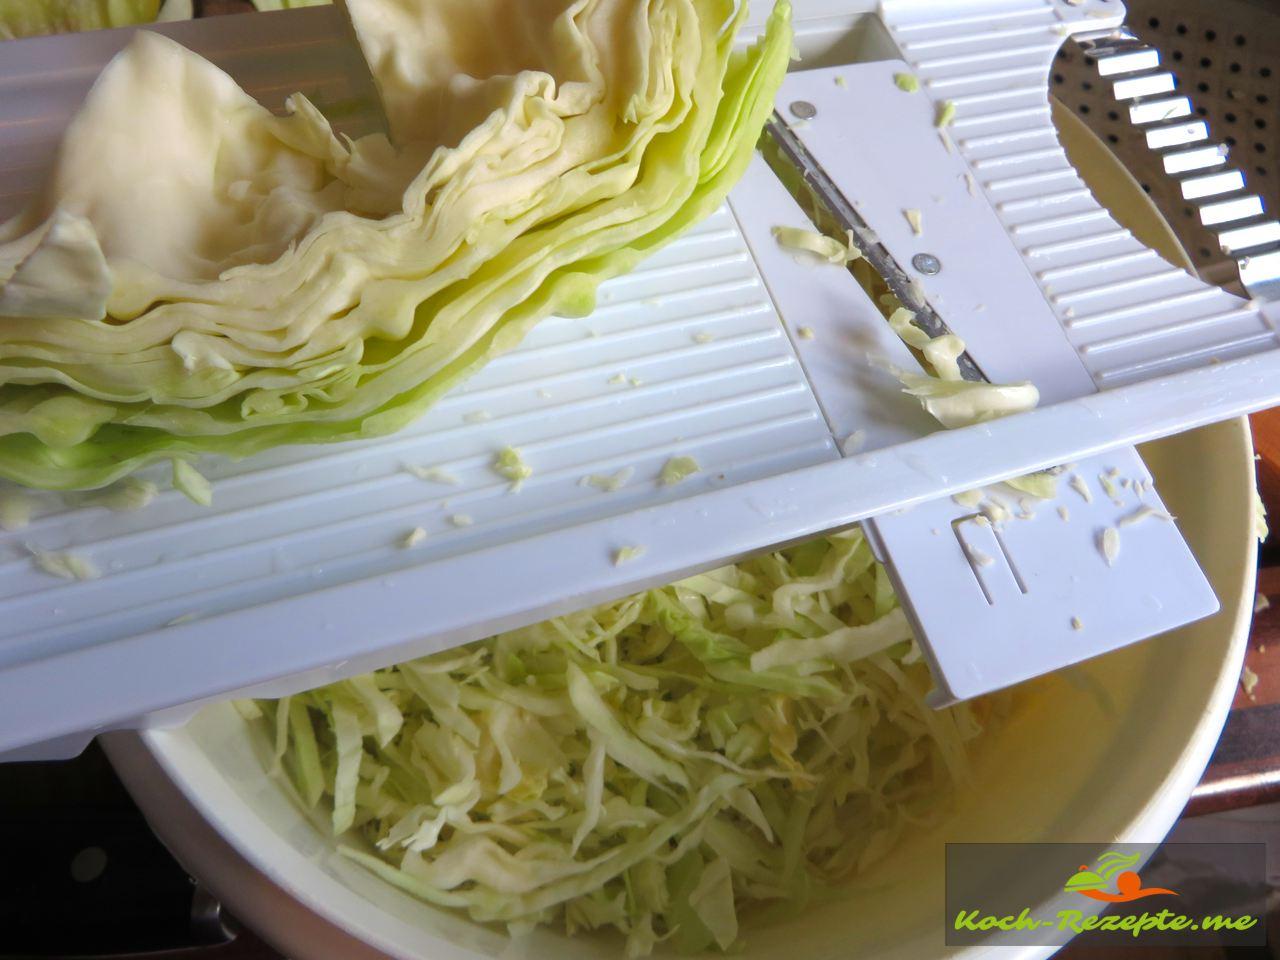 Weisskraut wird fein geschnitten